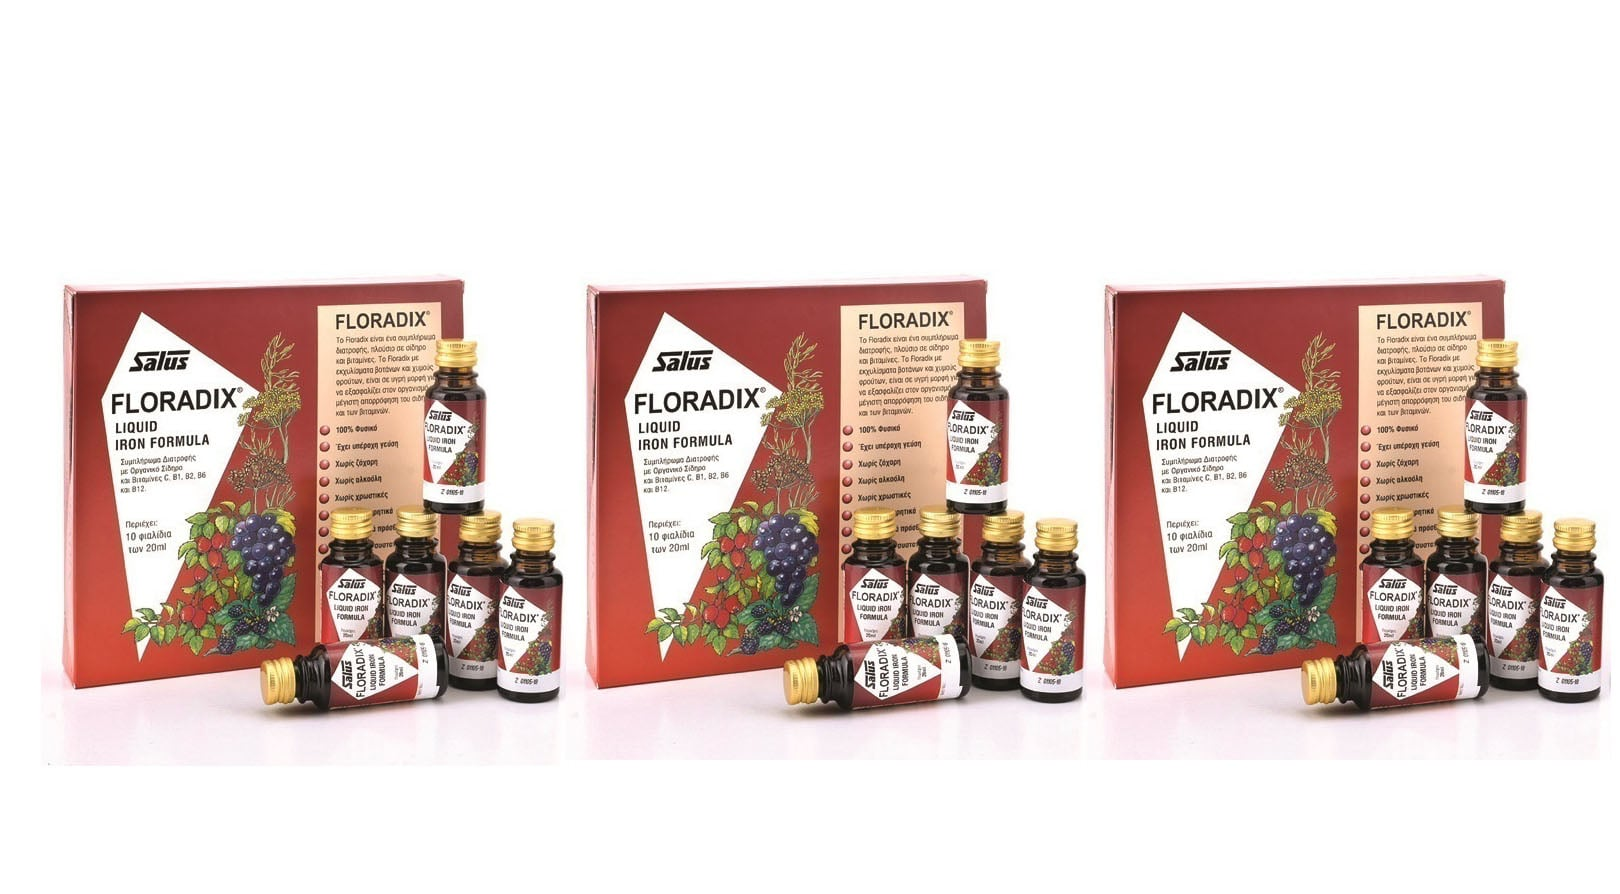 3 x Power Health Floradix Γυναικείο Τονωτικό με ειδικά εκχυλίσματα φρούτων, σίδηρο & βιταμίνες, 3 x (10x20ml)